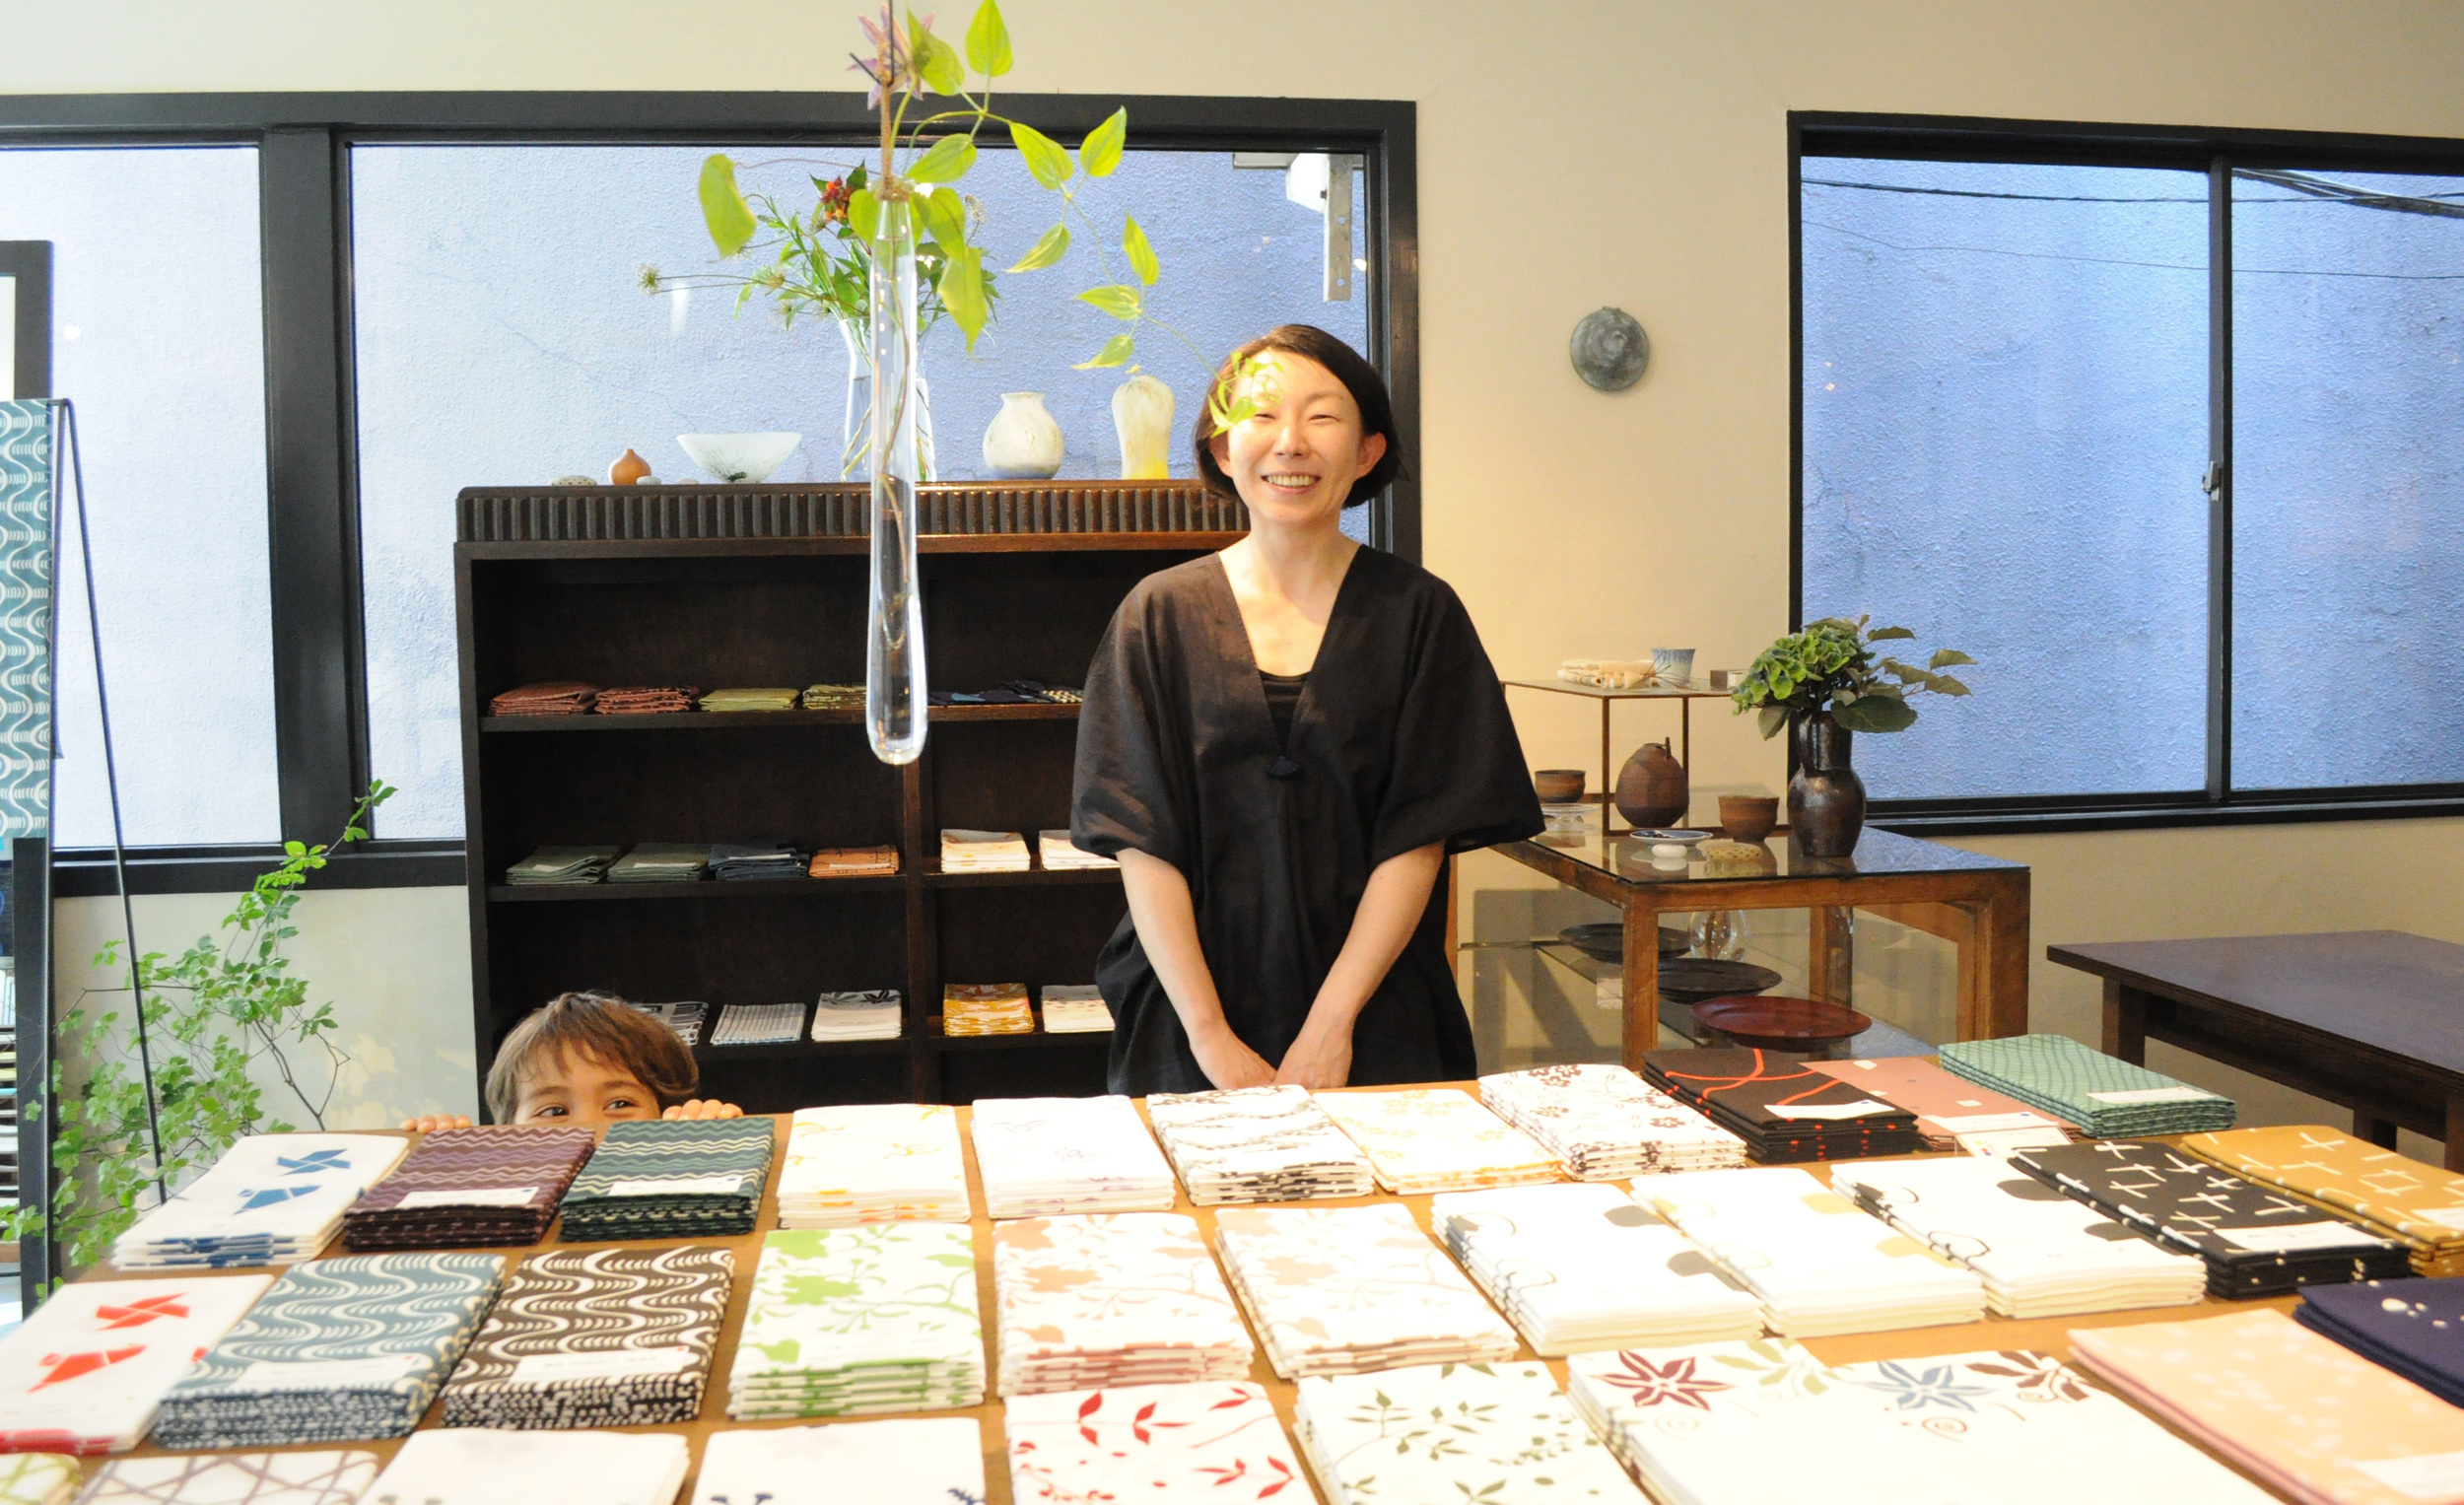 Yuki Nogucih at Ahiroya Tenugui Exhibition |La Ronde d'Argile (Kagurazaka, Tokyo)